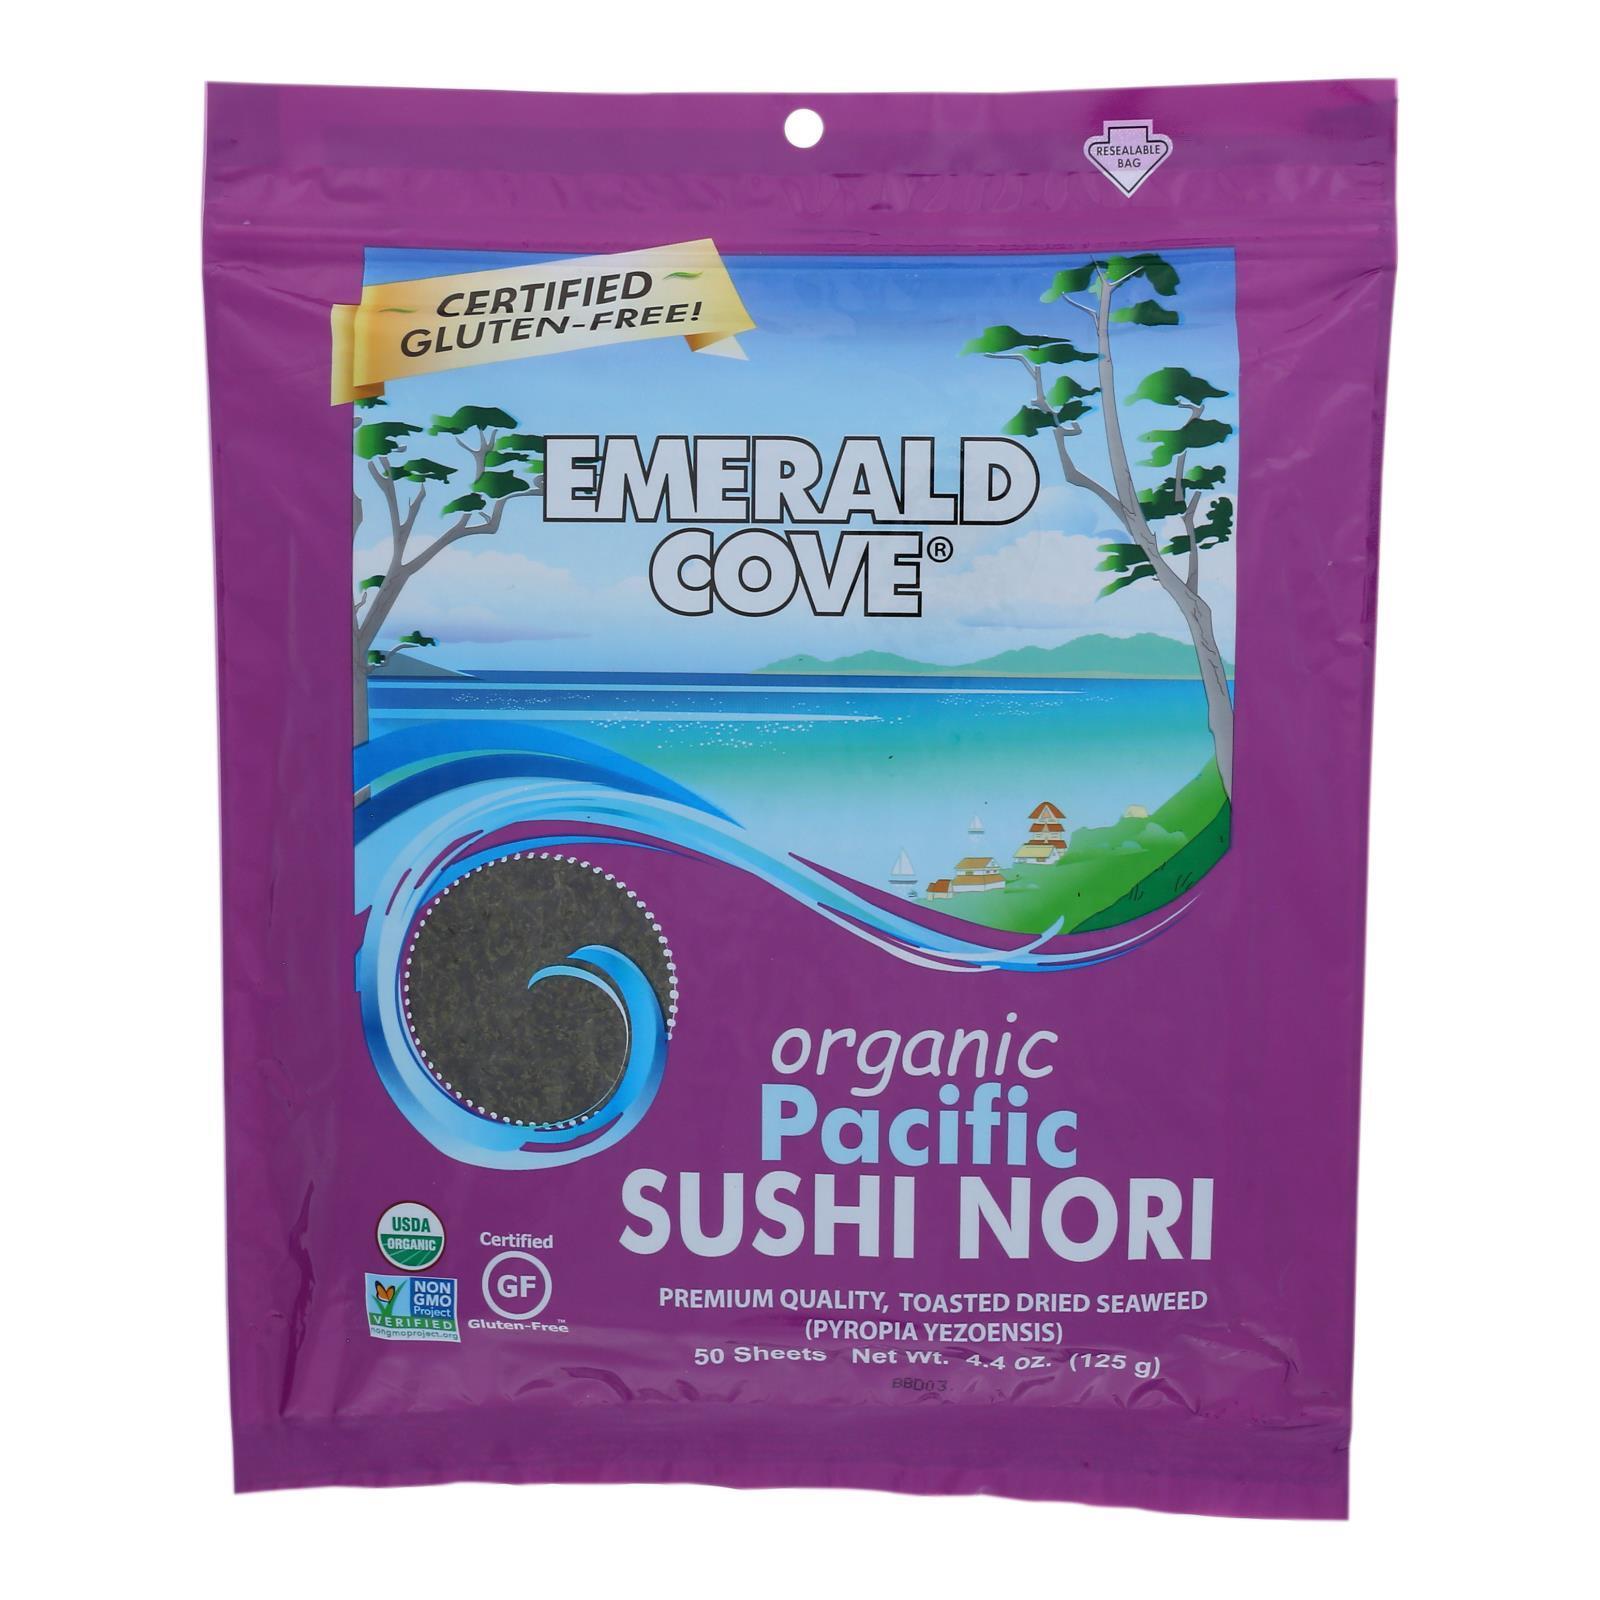 Emerald Cove Organic Pacific Sushi Nori - Toasted - Silver Grade - 50 Sheets - Case of 4